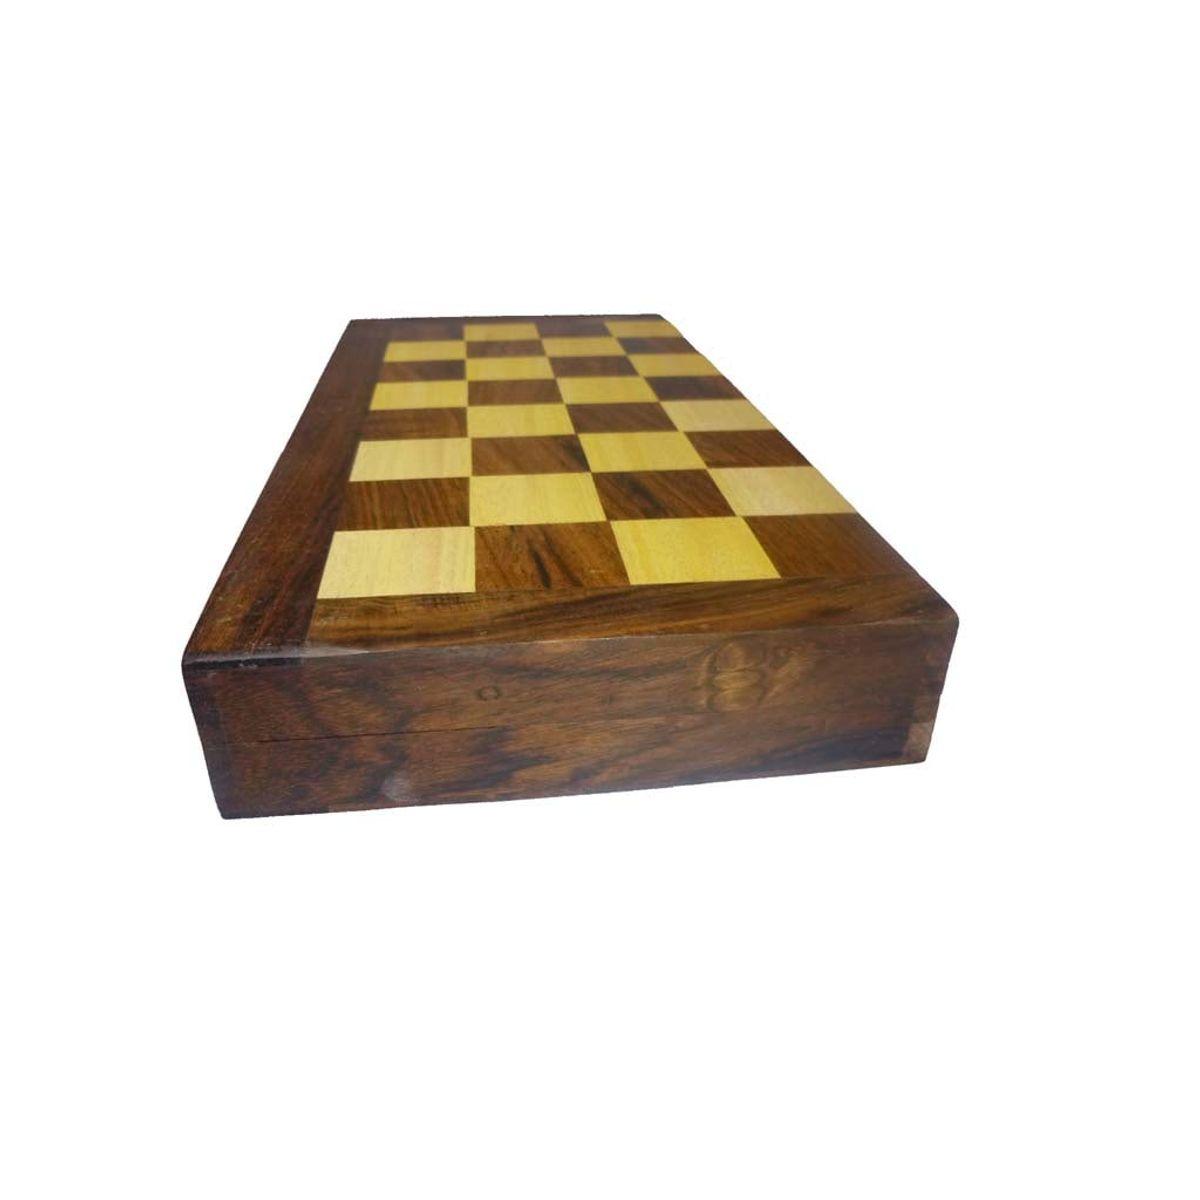 Craftofy Foldable Chess Board